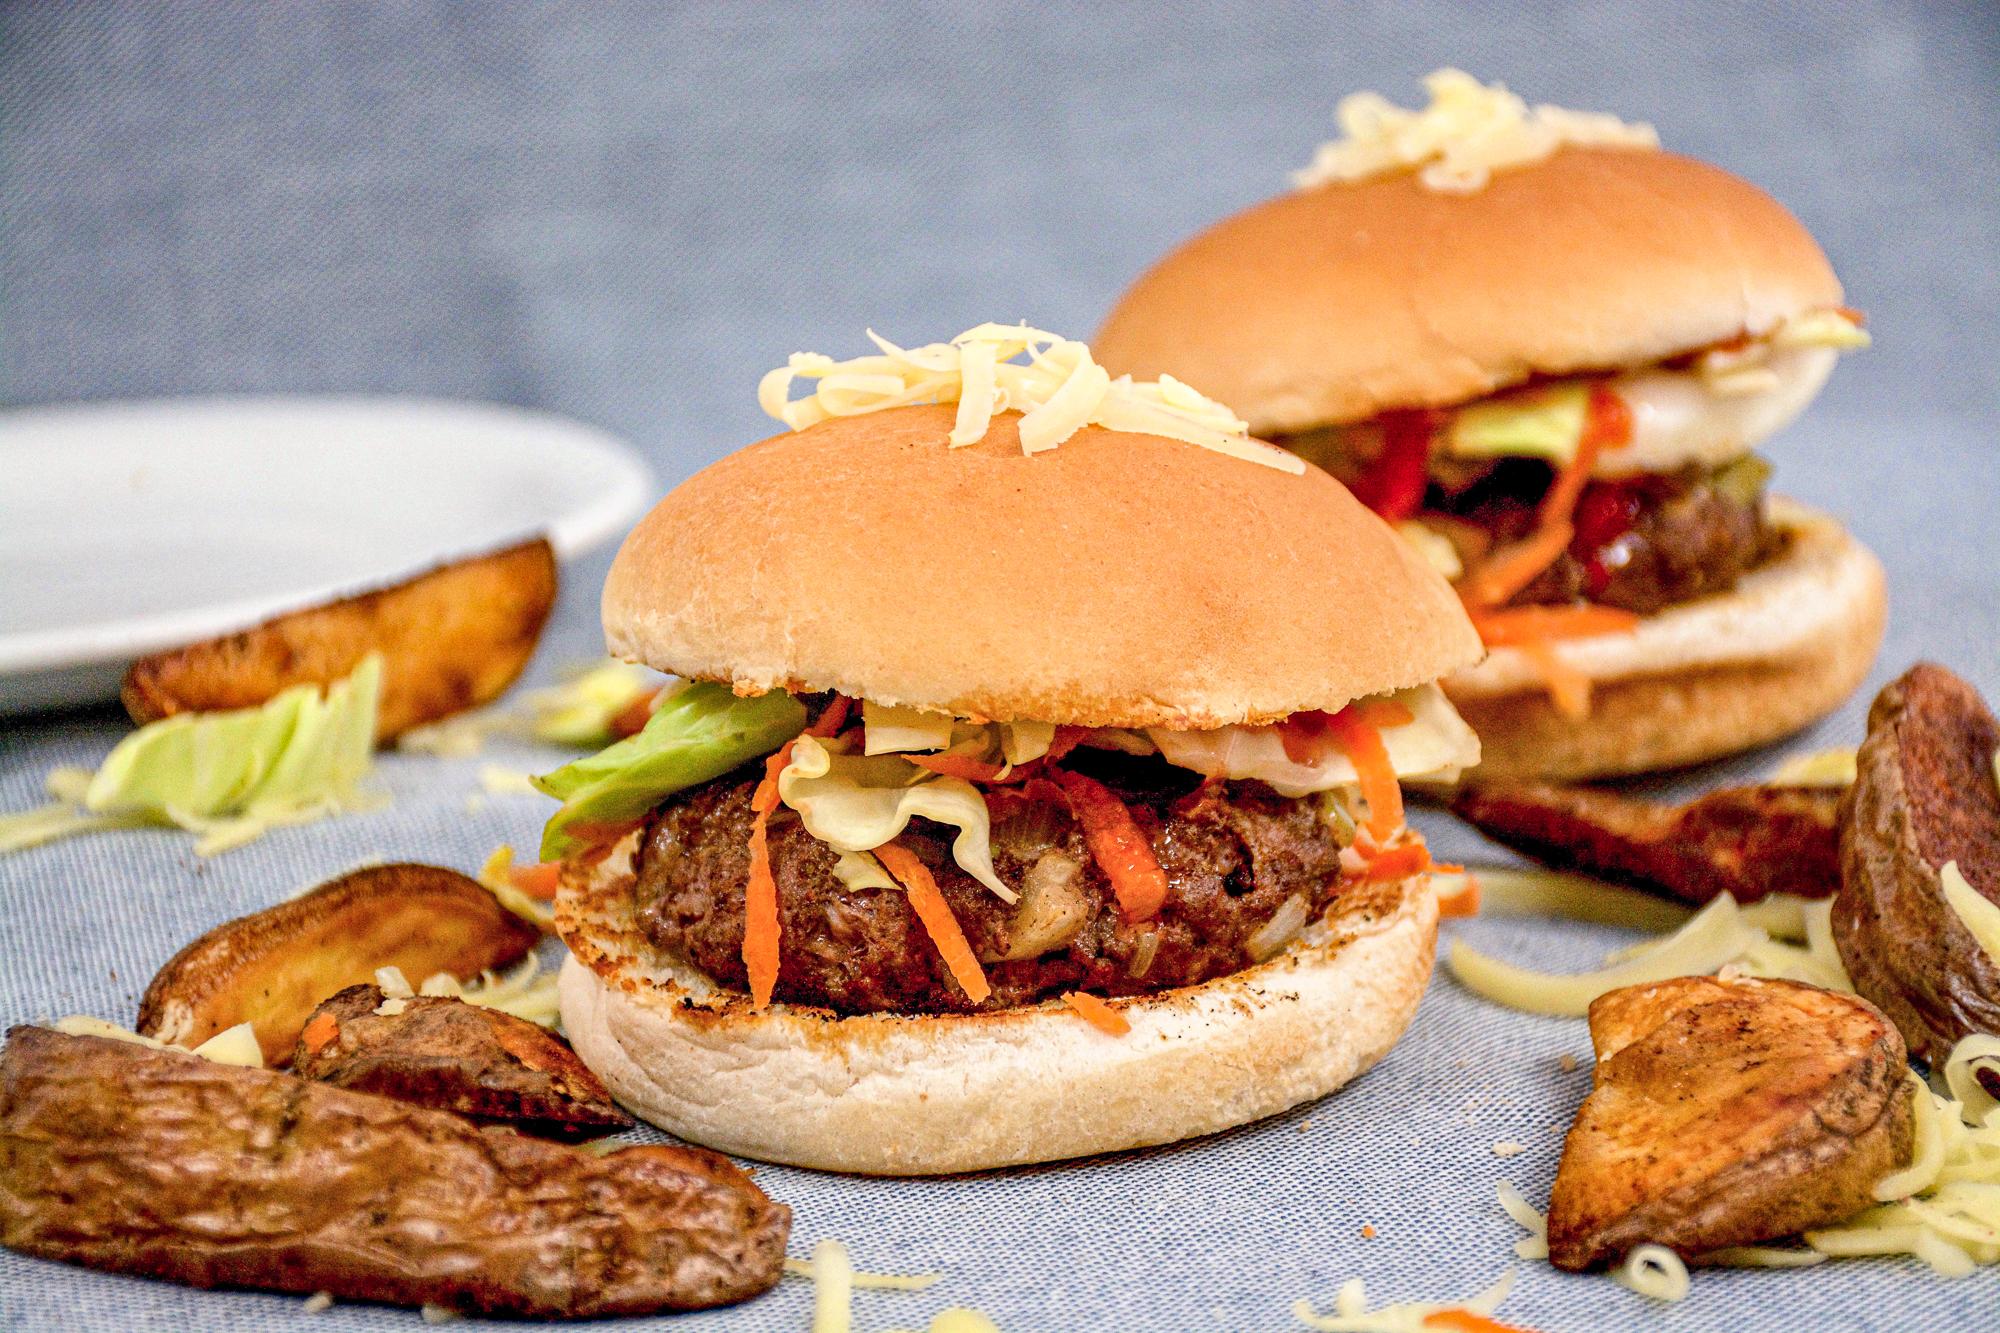 Burgers with Seasoned Wedges